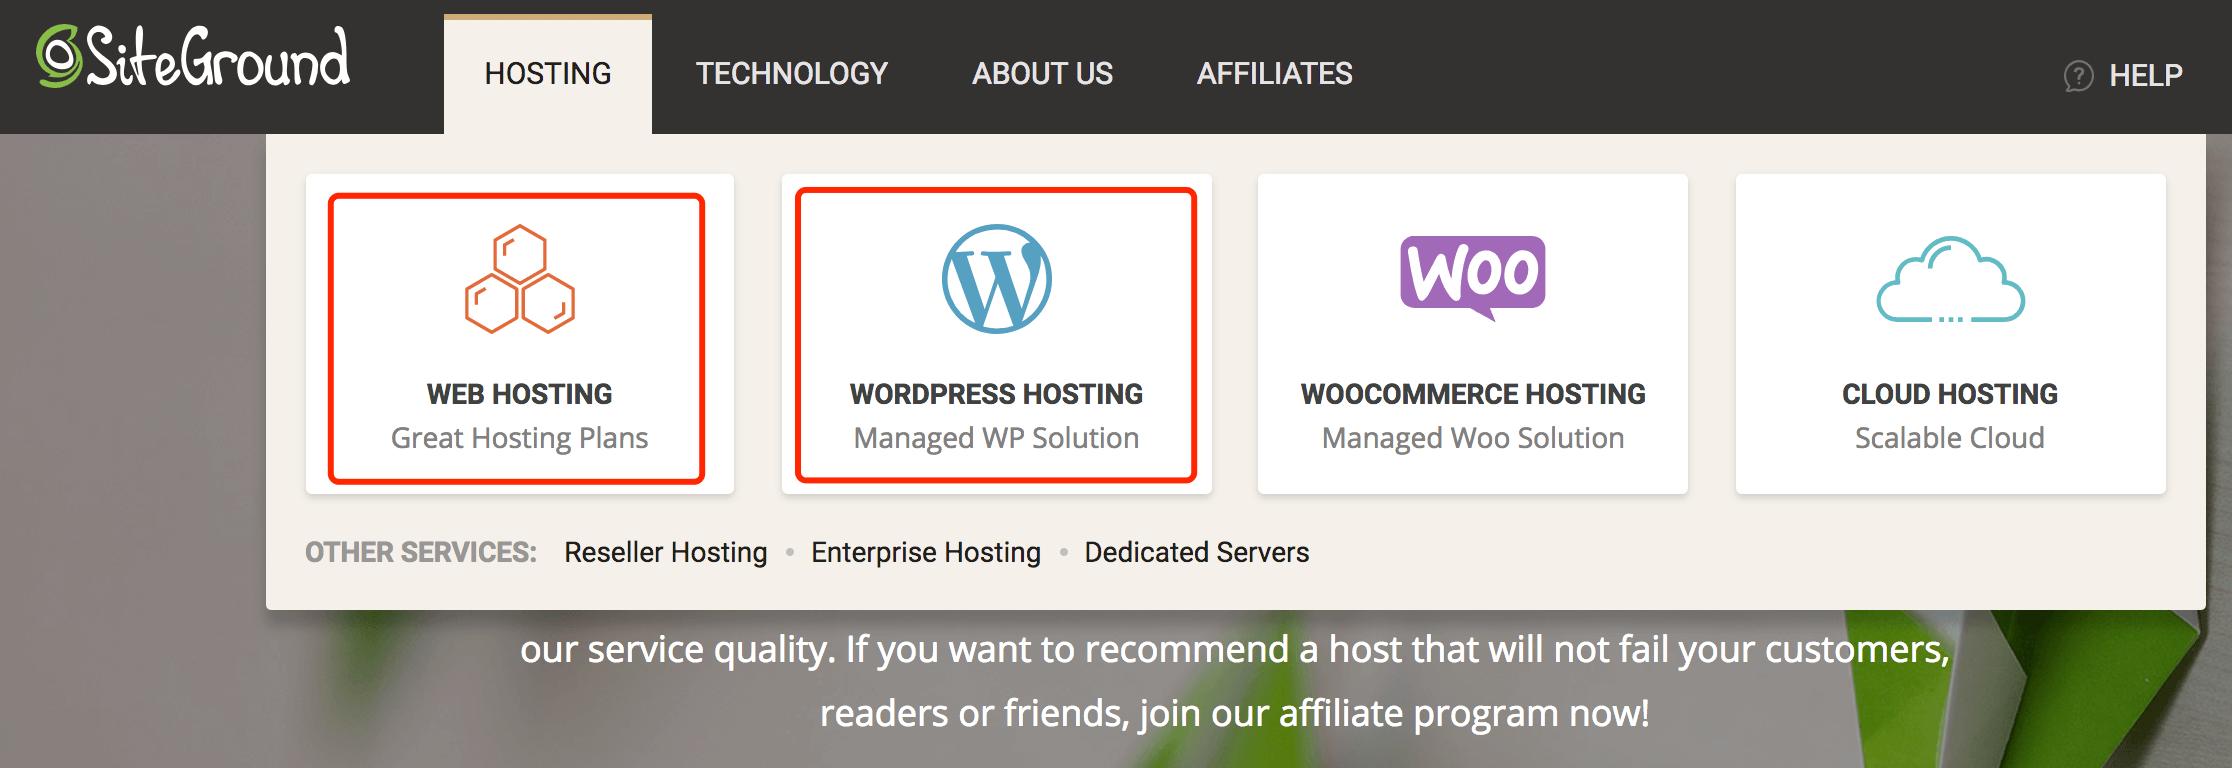 SiteGround的Web Hosting和WordPress Hosting怎么选?有什么区别?